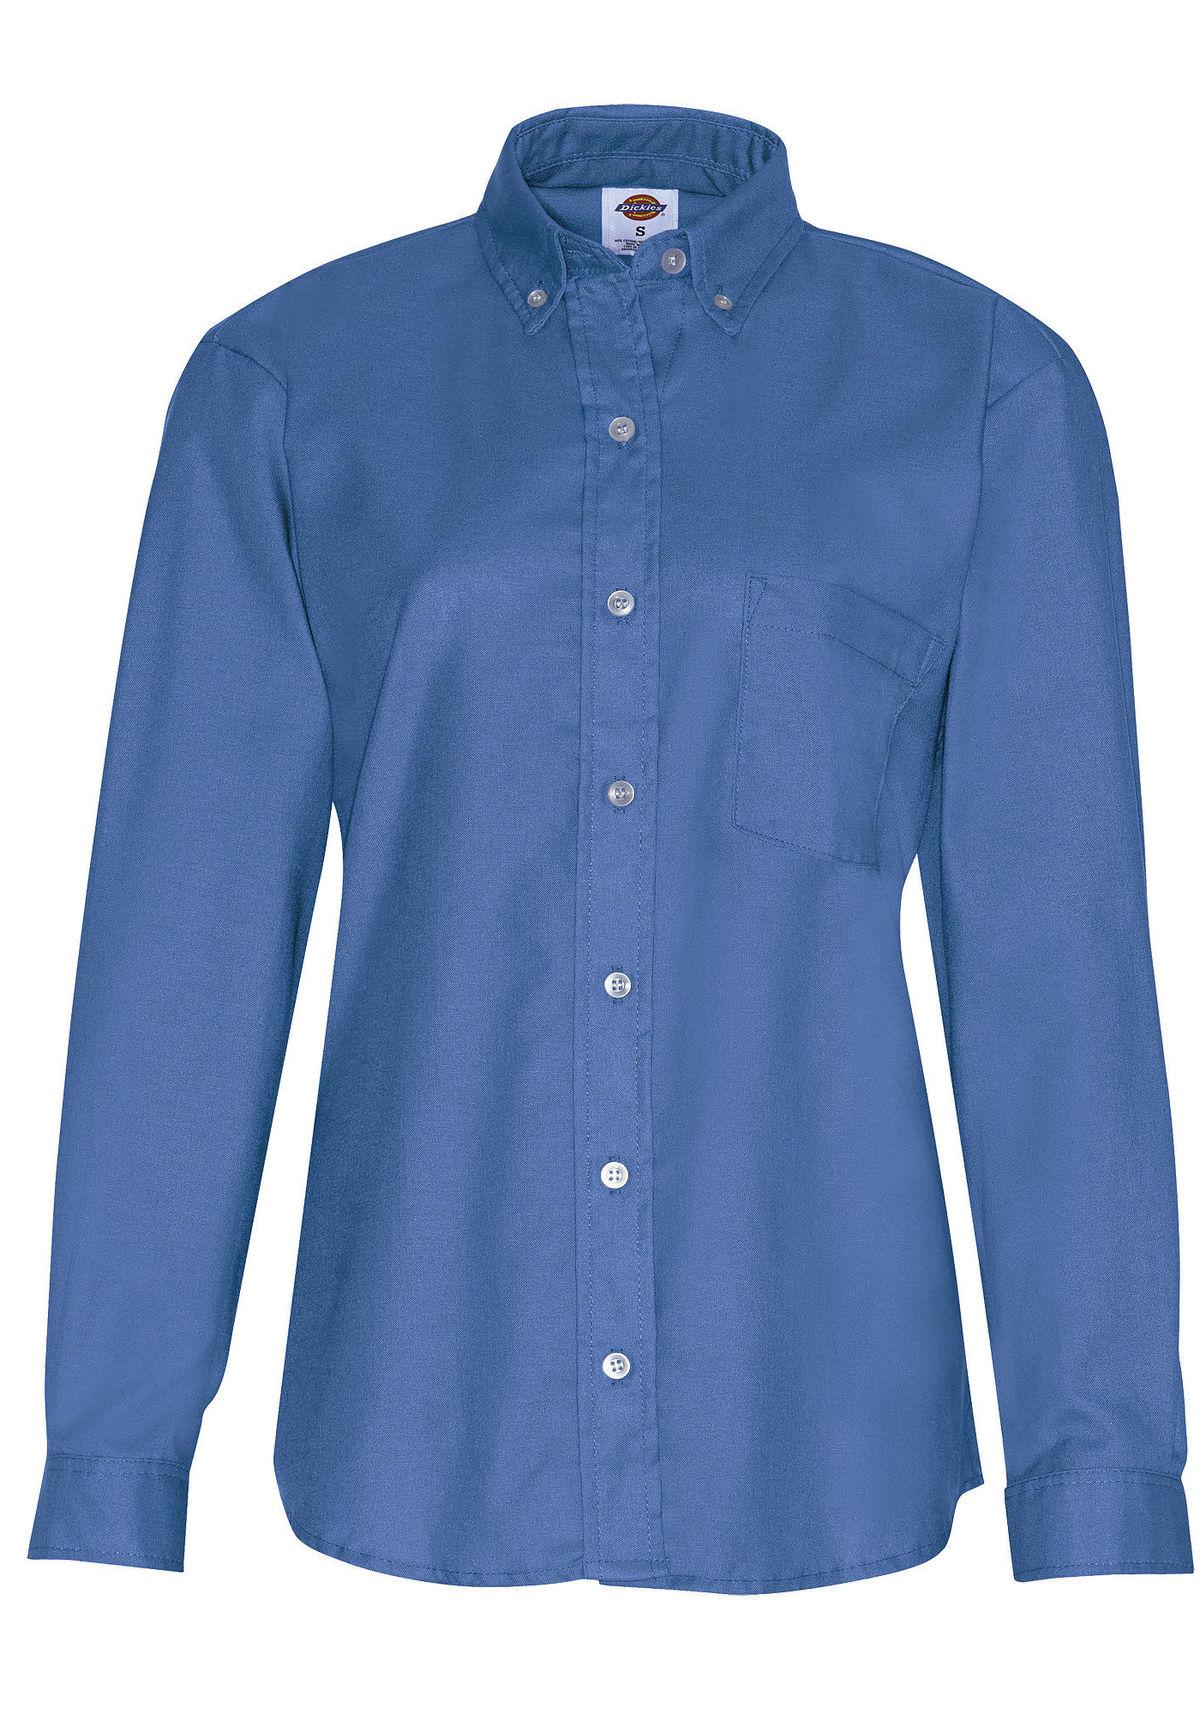 Dickies 254 Women's Button Down Oxford Shirt Long Sleeve ...